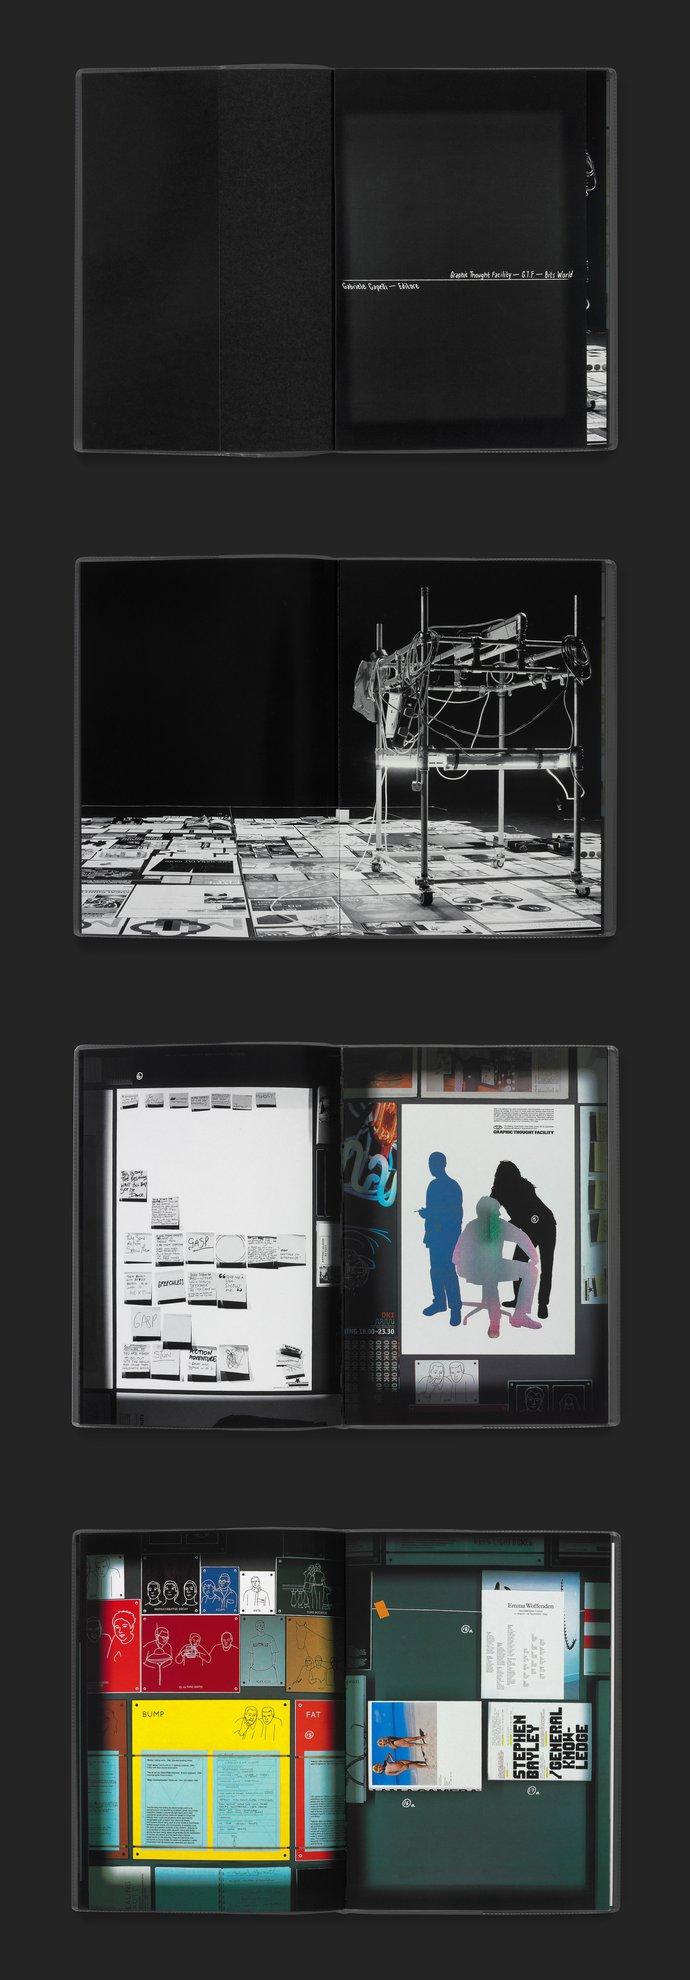 Gabrielle Capelli Editions – GTF: Bits World, 2001 (Publication), image 3